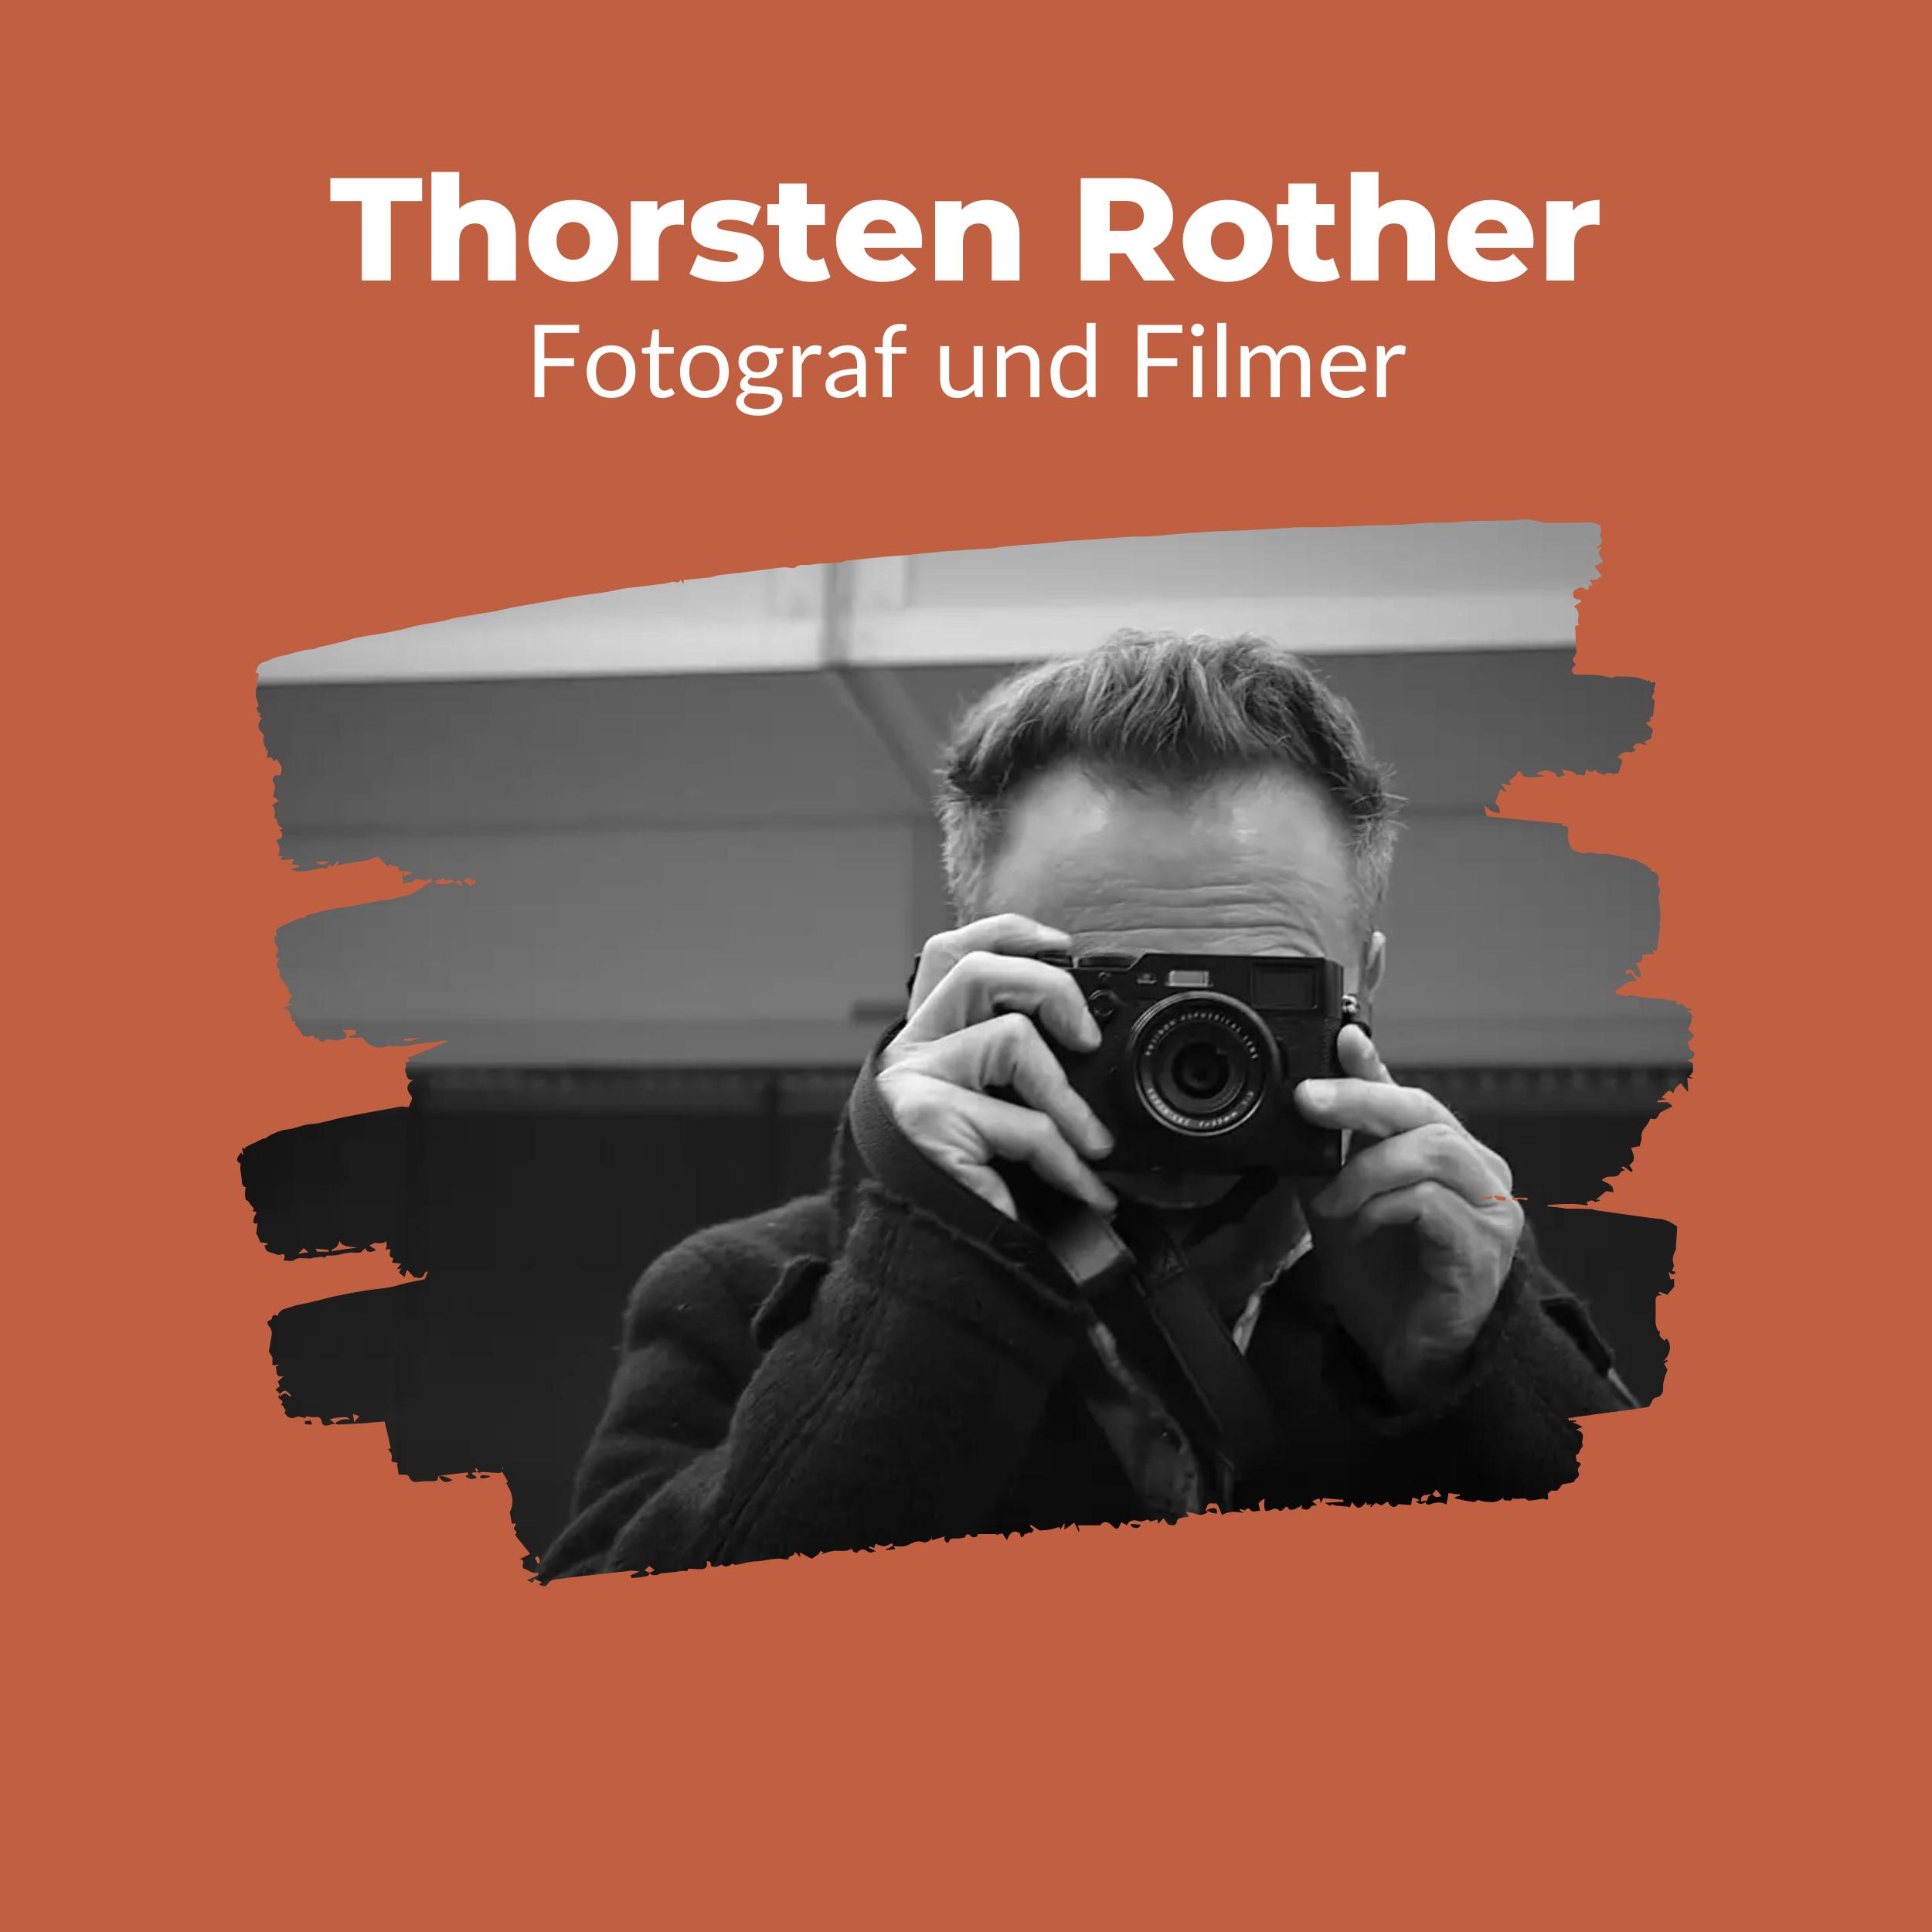 Thorsten Rother